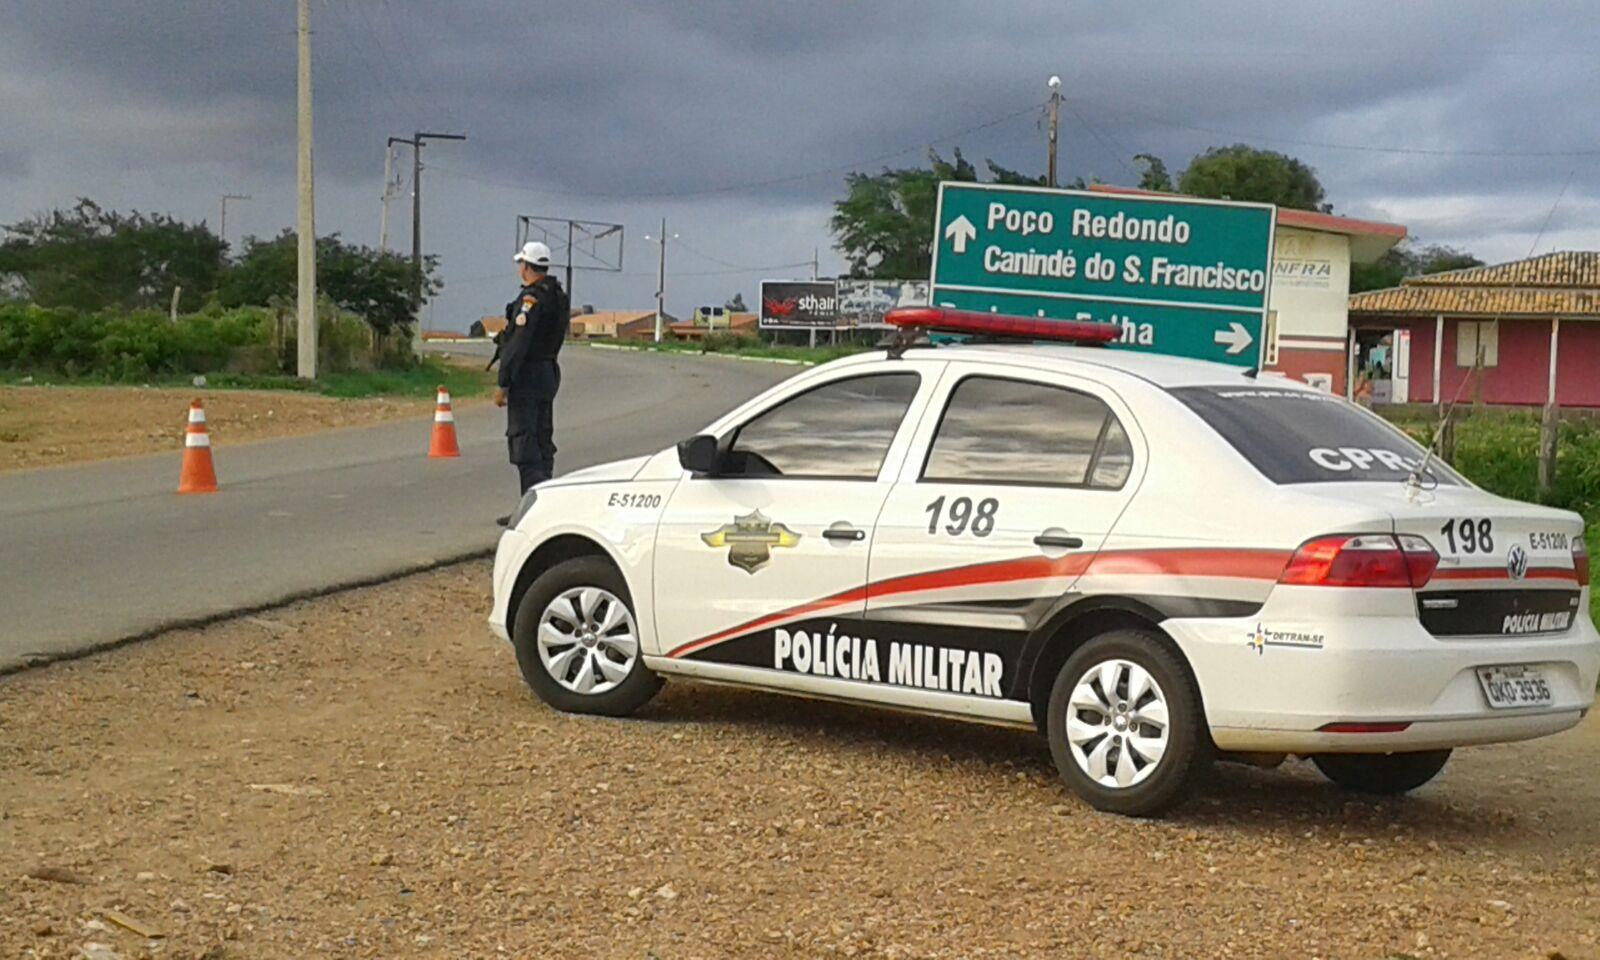 CPRv incia Operação Rodovia Segura na Semana Santa